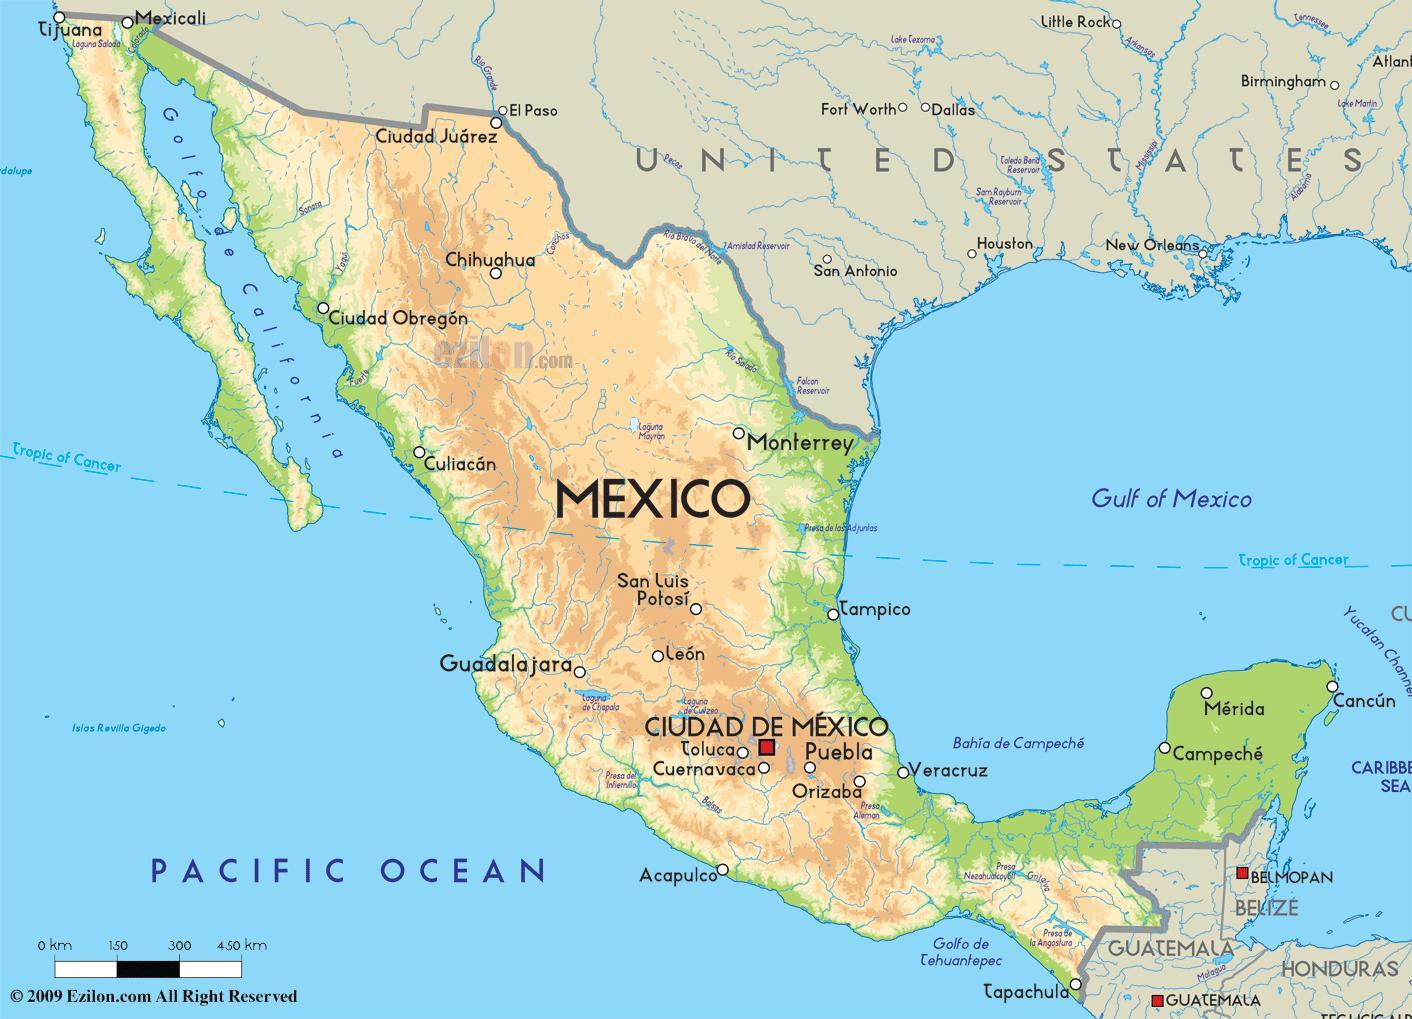 karta mexico Mexiko karta   Karta Mexiko (Central Amerika   nord och sydamerika) karta mexico